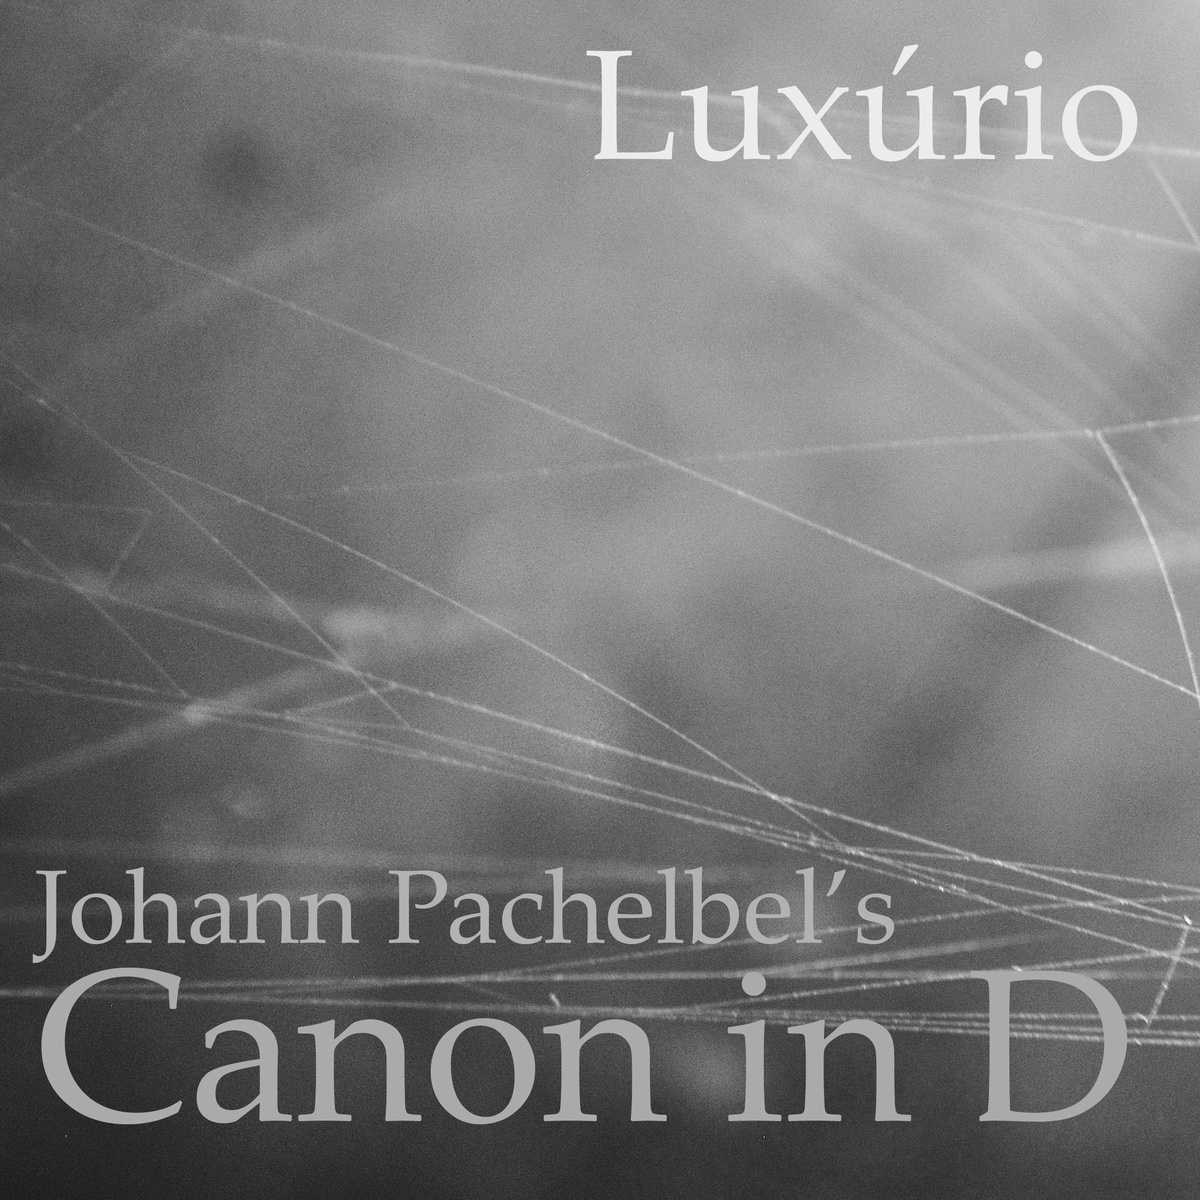 Pachelbel Canon, Classical music. Johann Pachelbel